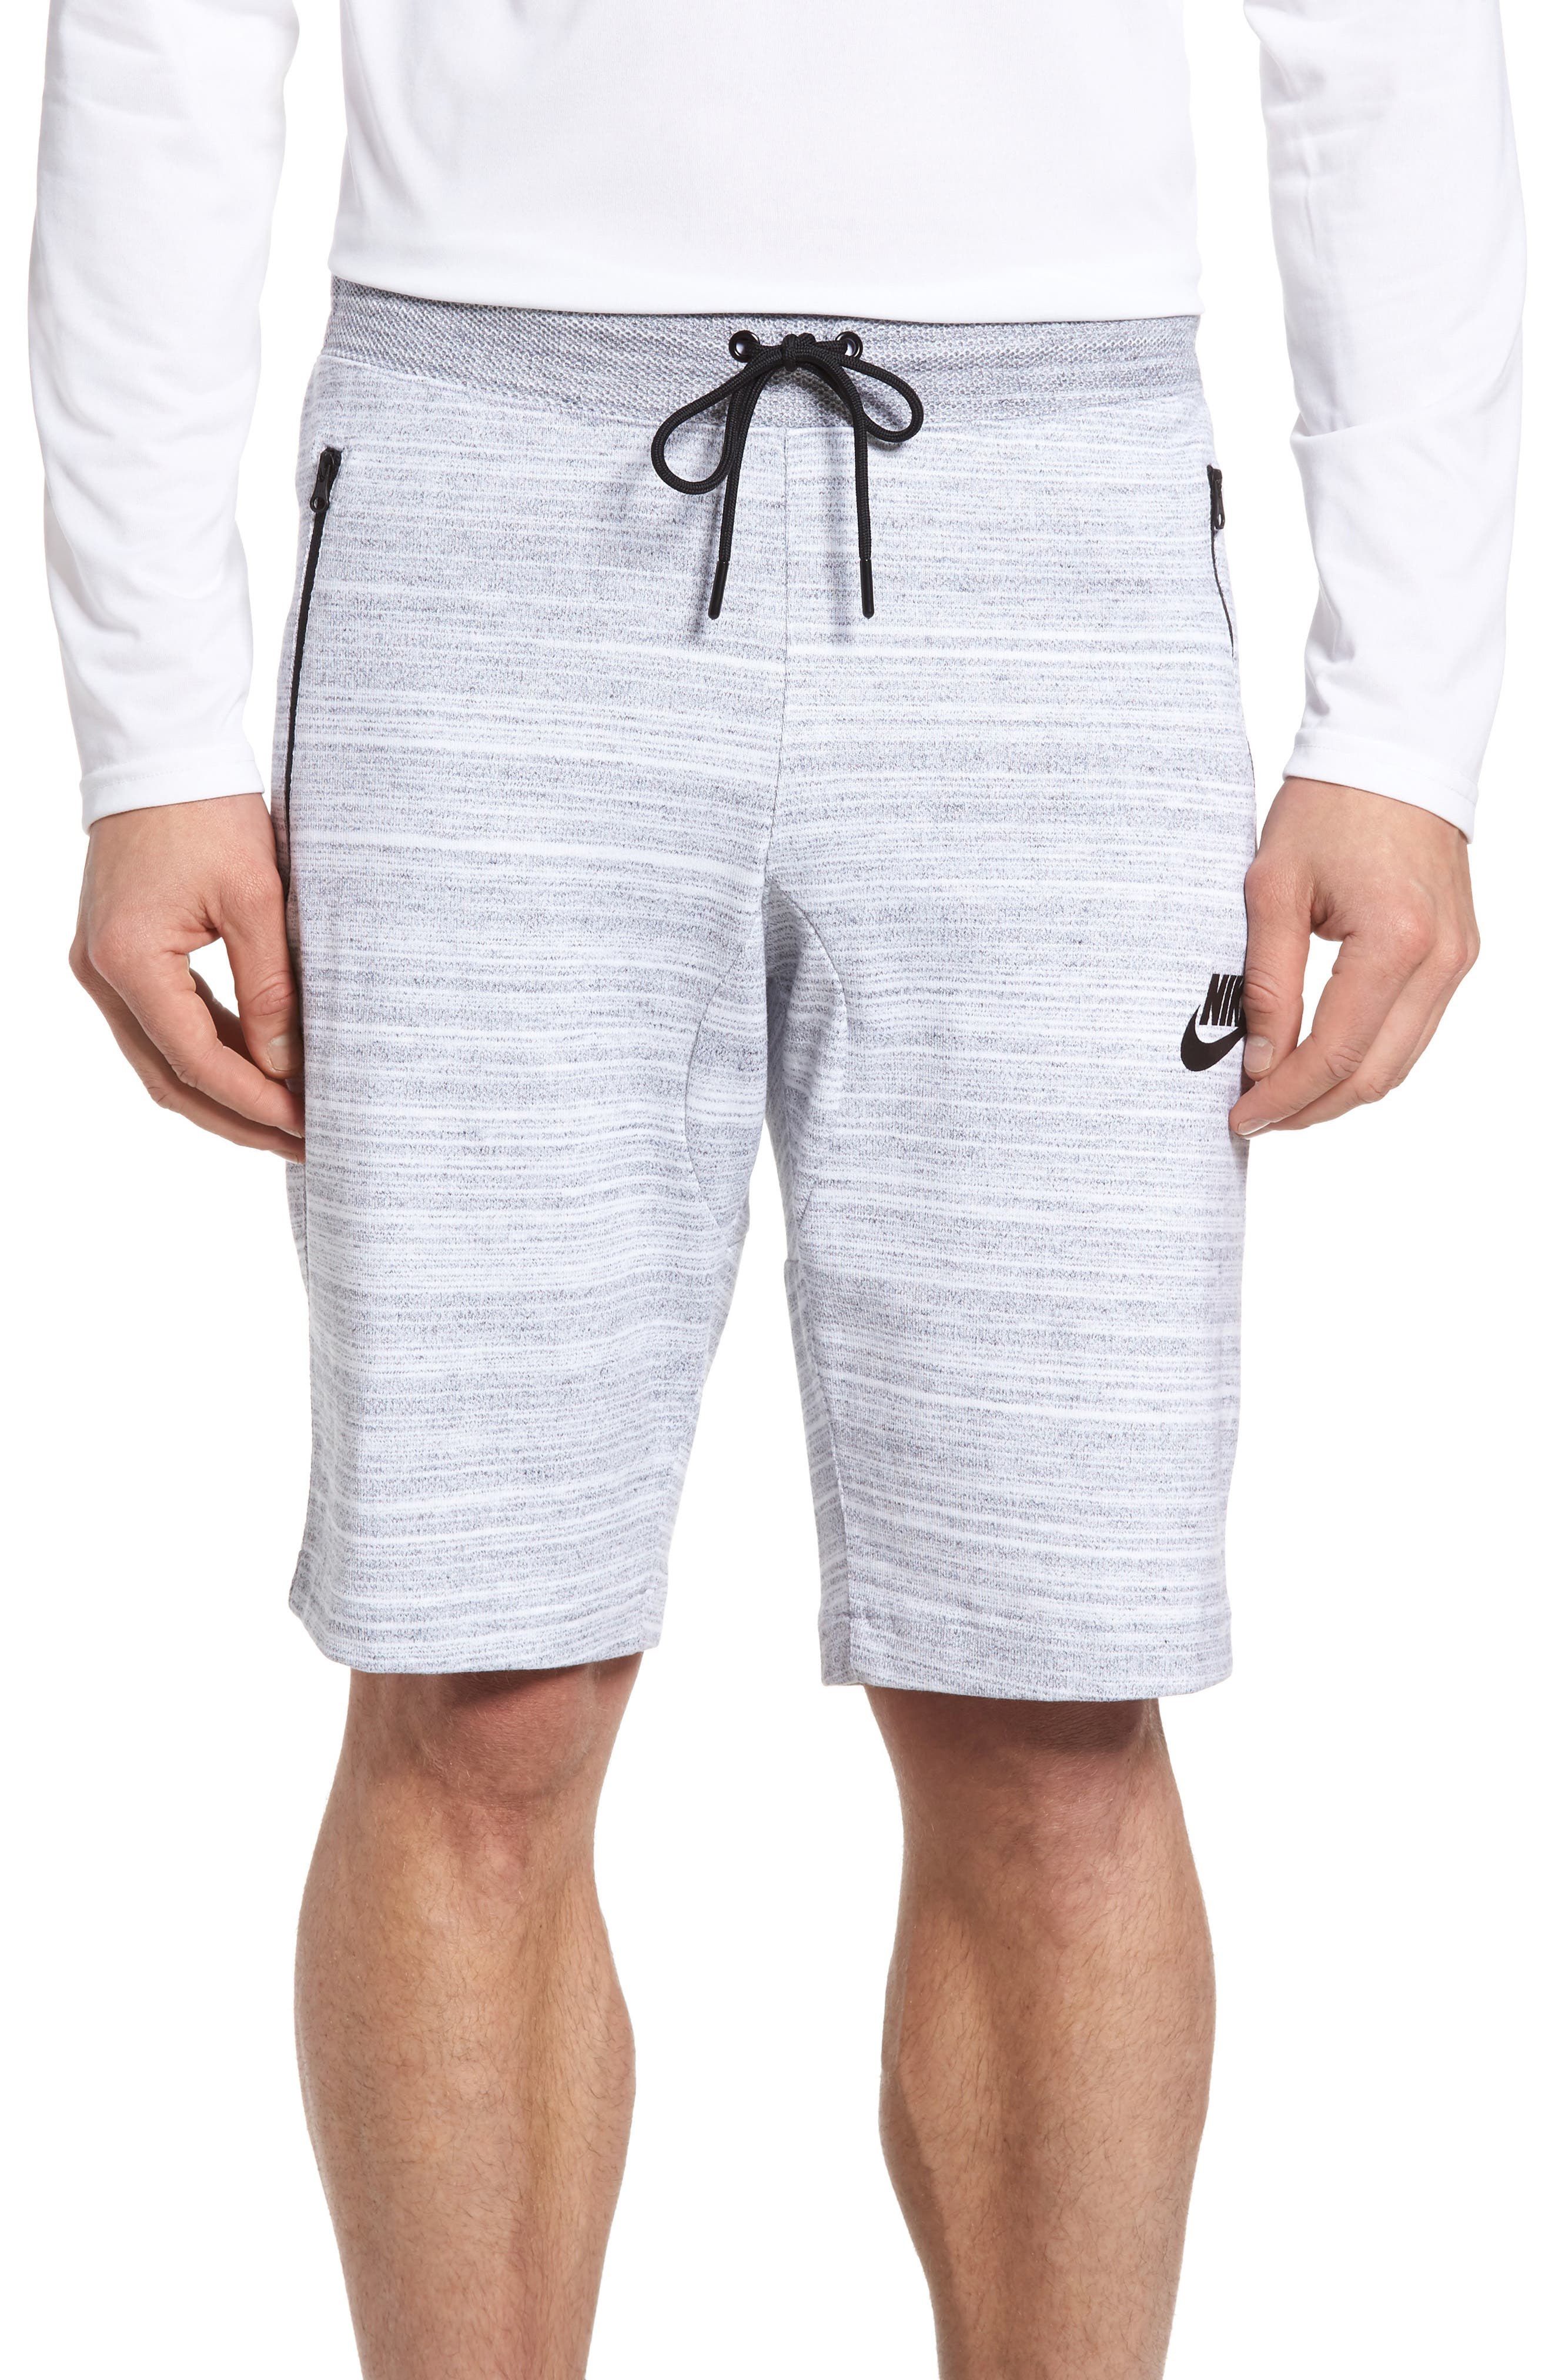 Sweat Shorts & Jogger Shorts for Men | Nordstrom